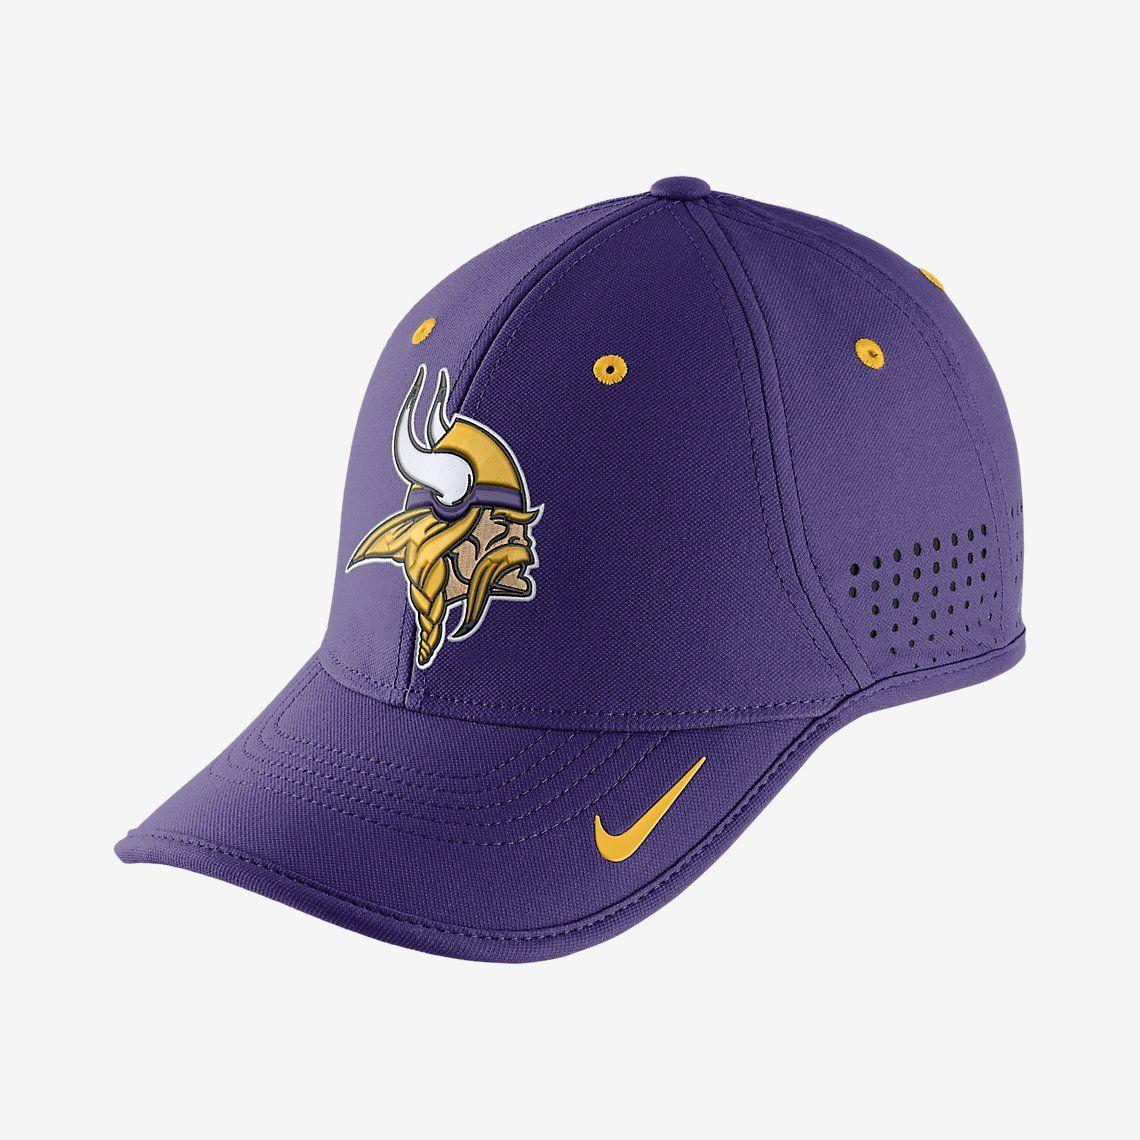 658a023e8 Nike True Vapor (NFL Vikings) Adjustable Hat. Nike.com | Christmas ...